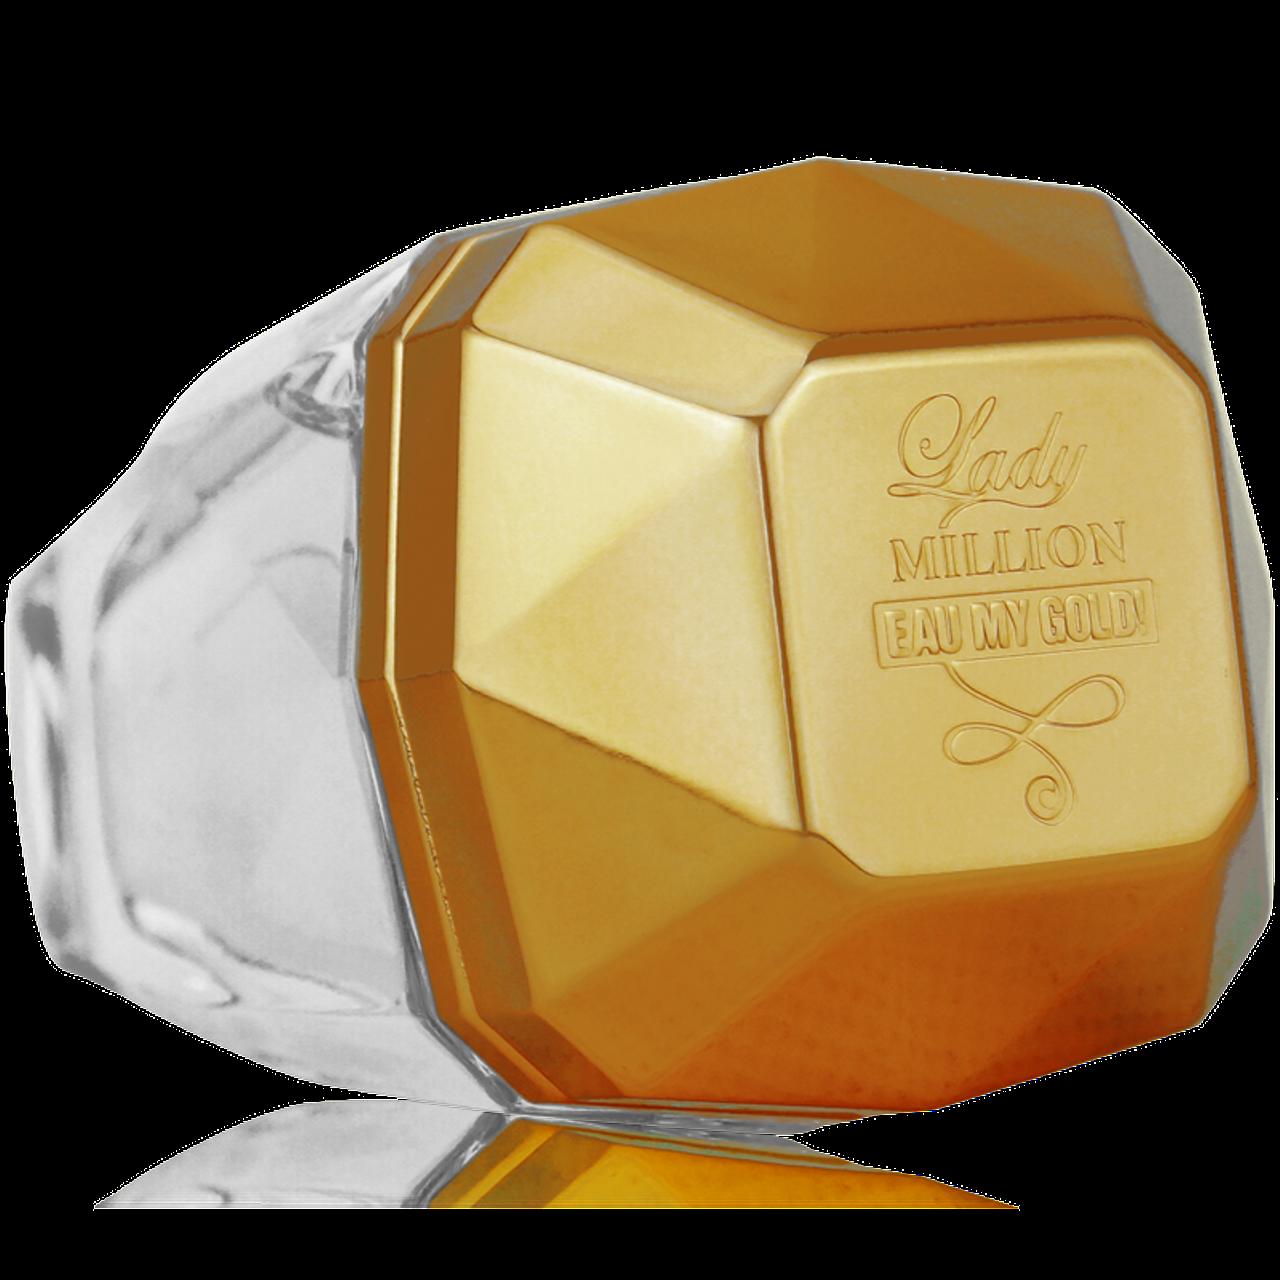 Paco Rabanne Lady Million Eau My Gold EdT 30ml